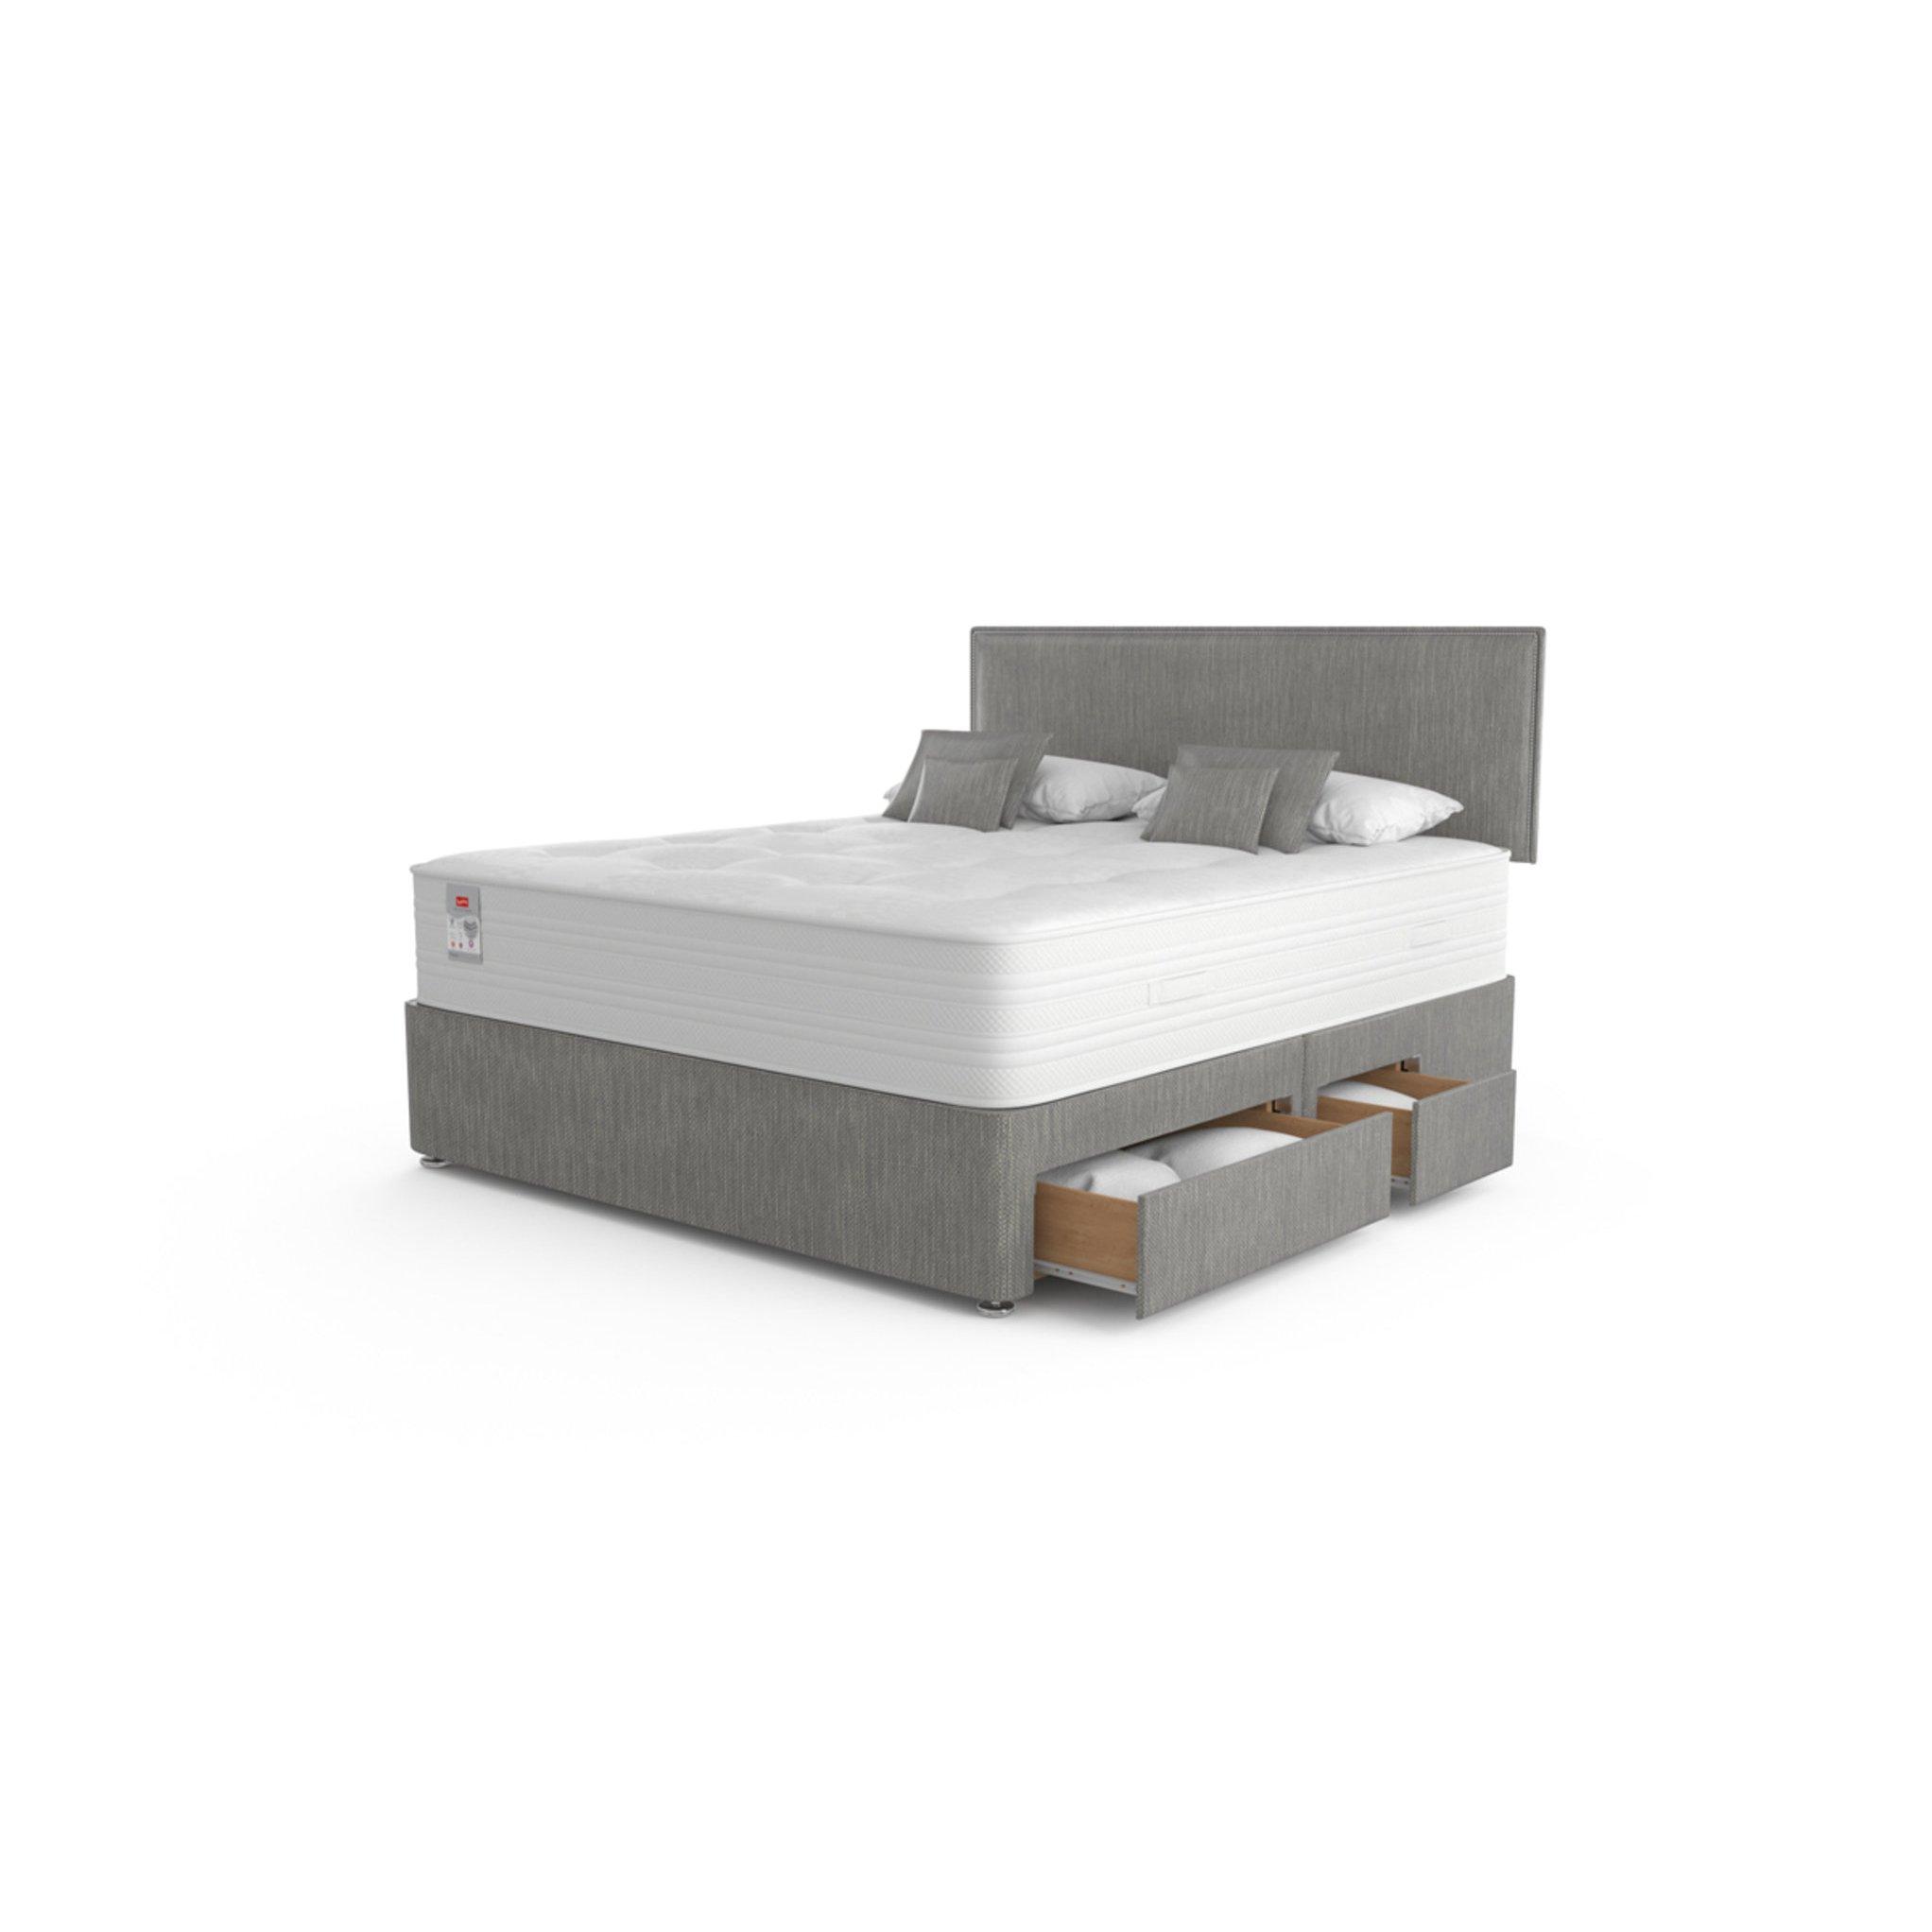 image-Slumberland Plaza Pocket 2200 Pillow Top Divan Bed Set